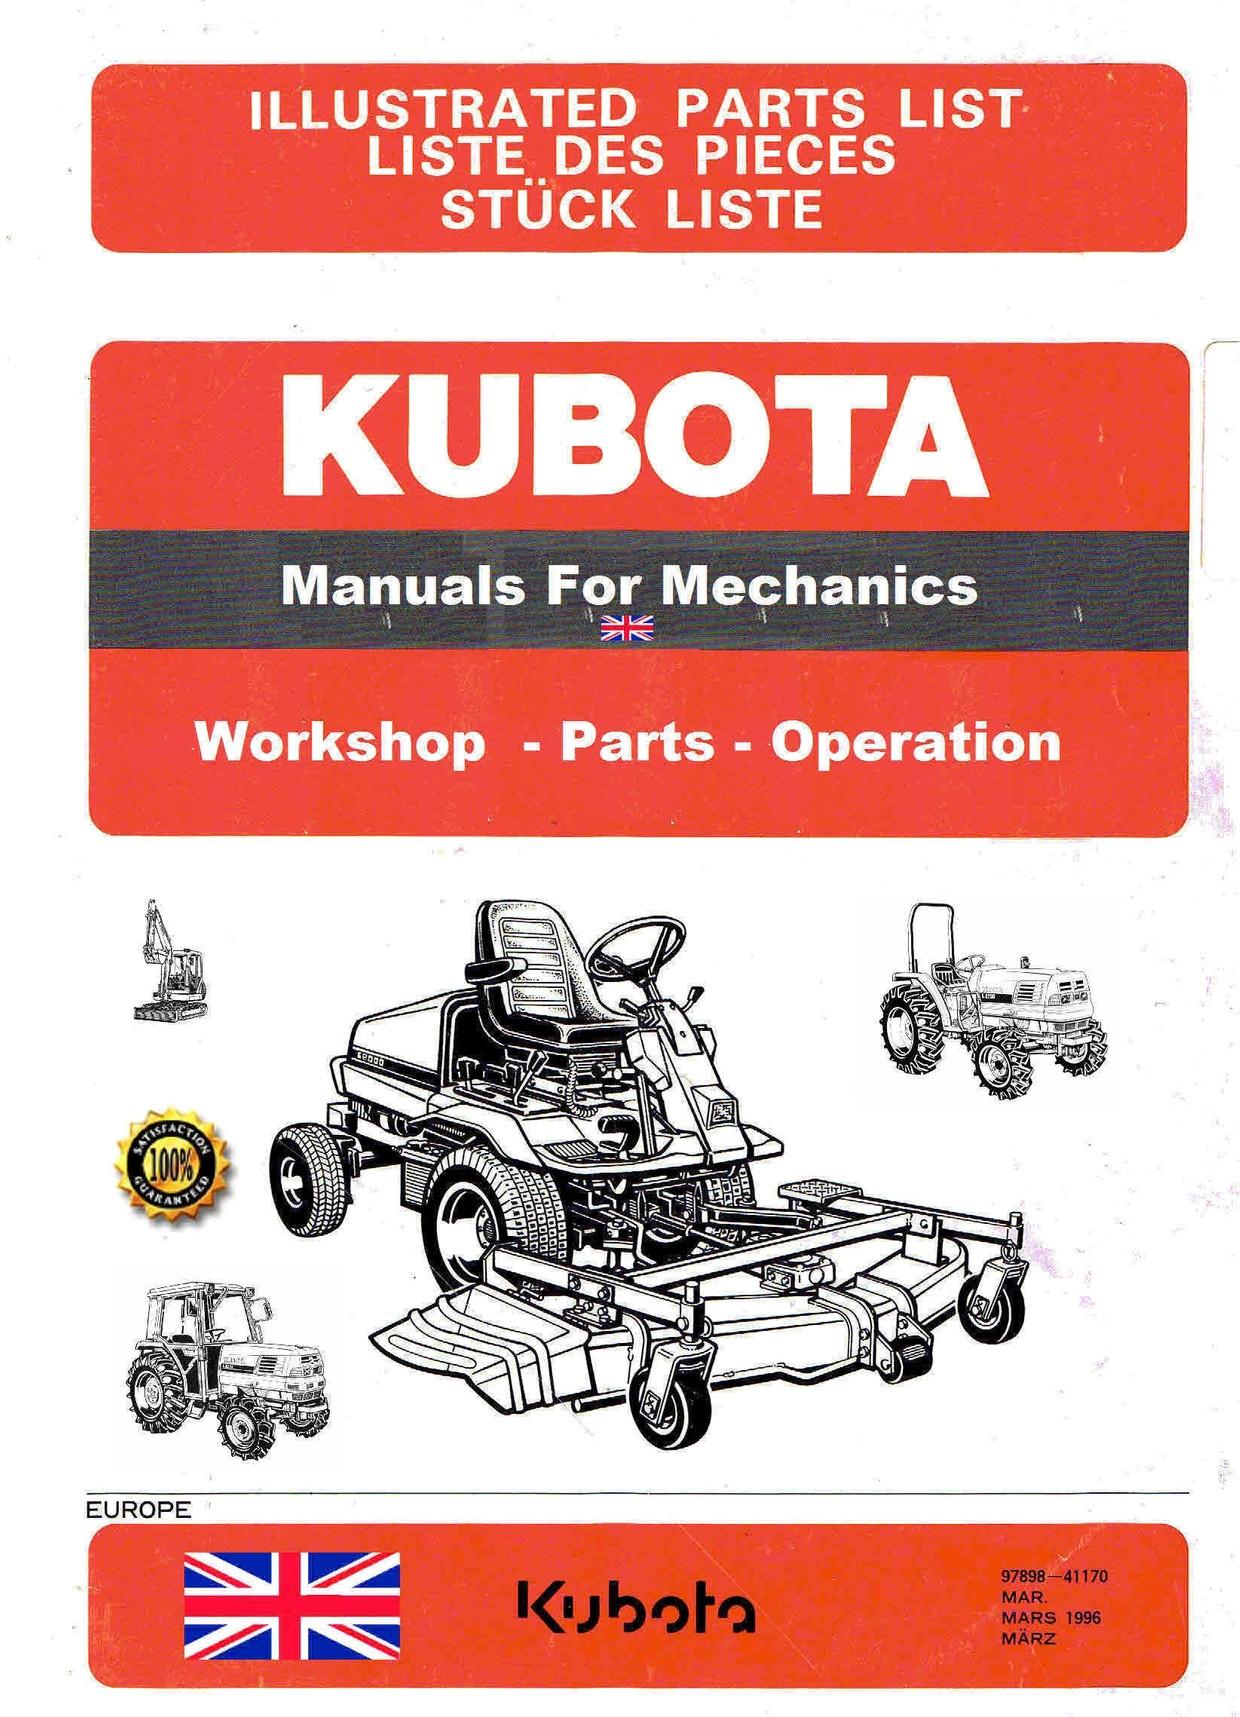 Kubota Manuals For Mechanics Themanualman